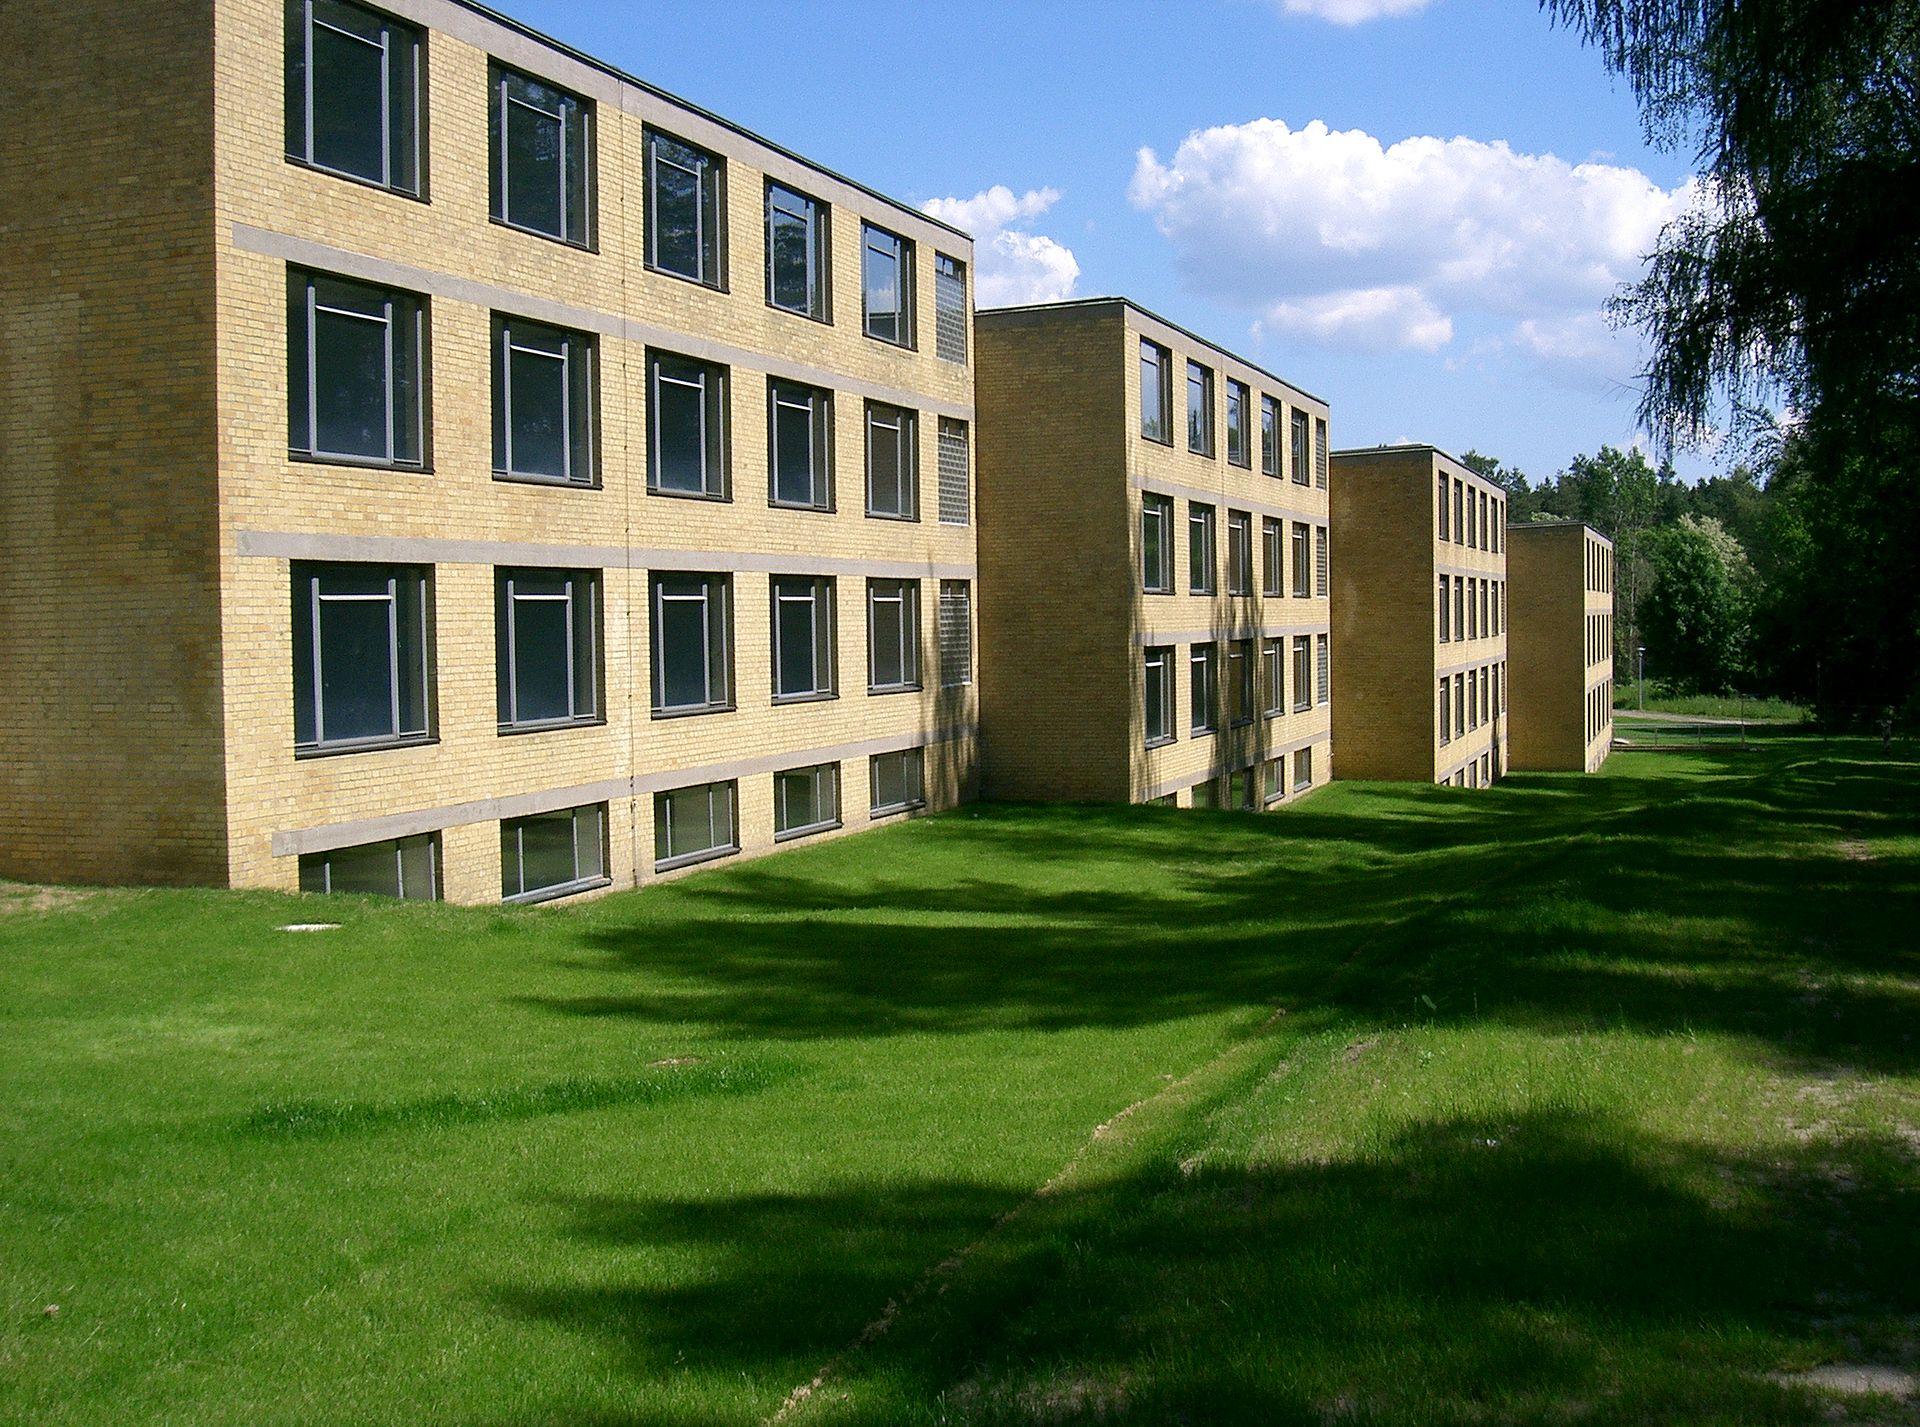 Bauhausdenkmal Bundesschule Bernau | seinsart